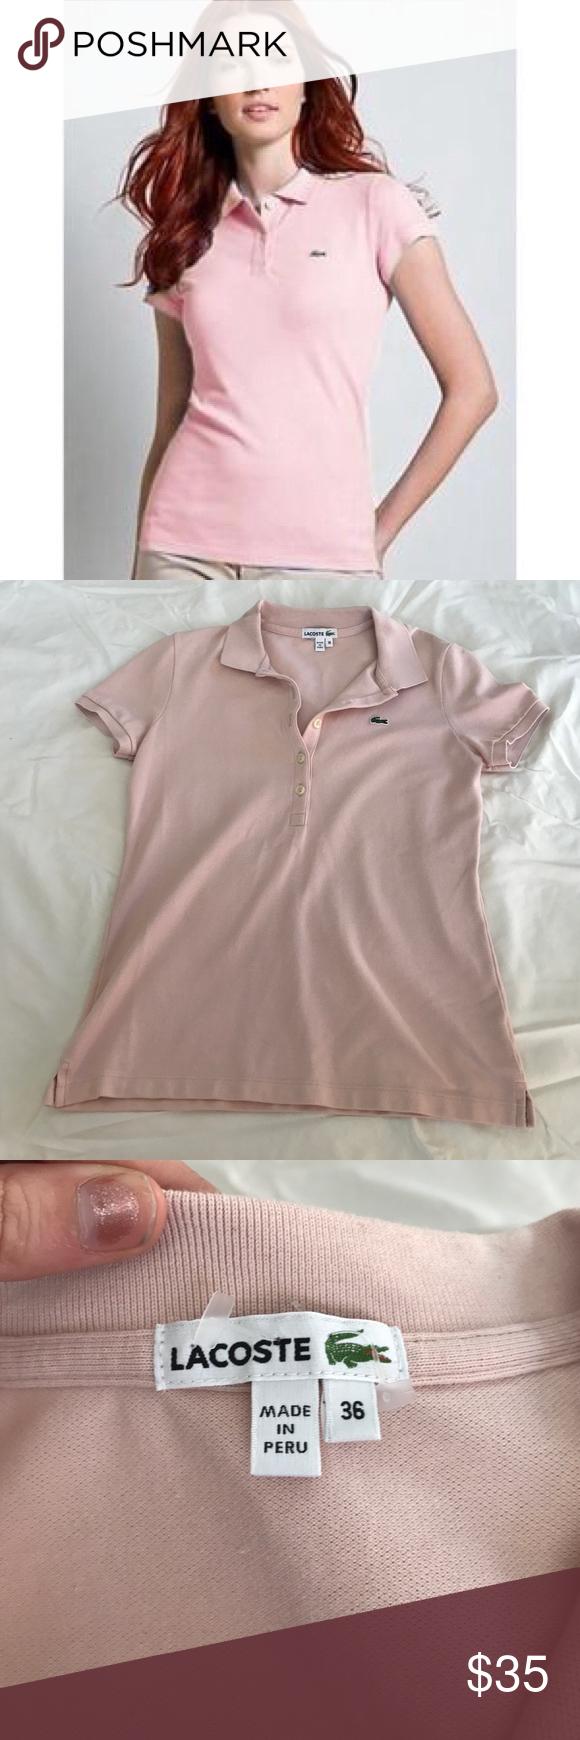 3792bd7d350b0b Lacoste Women s Baby Pink Polo